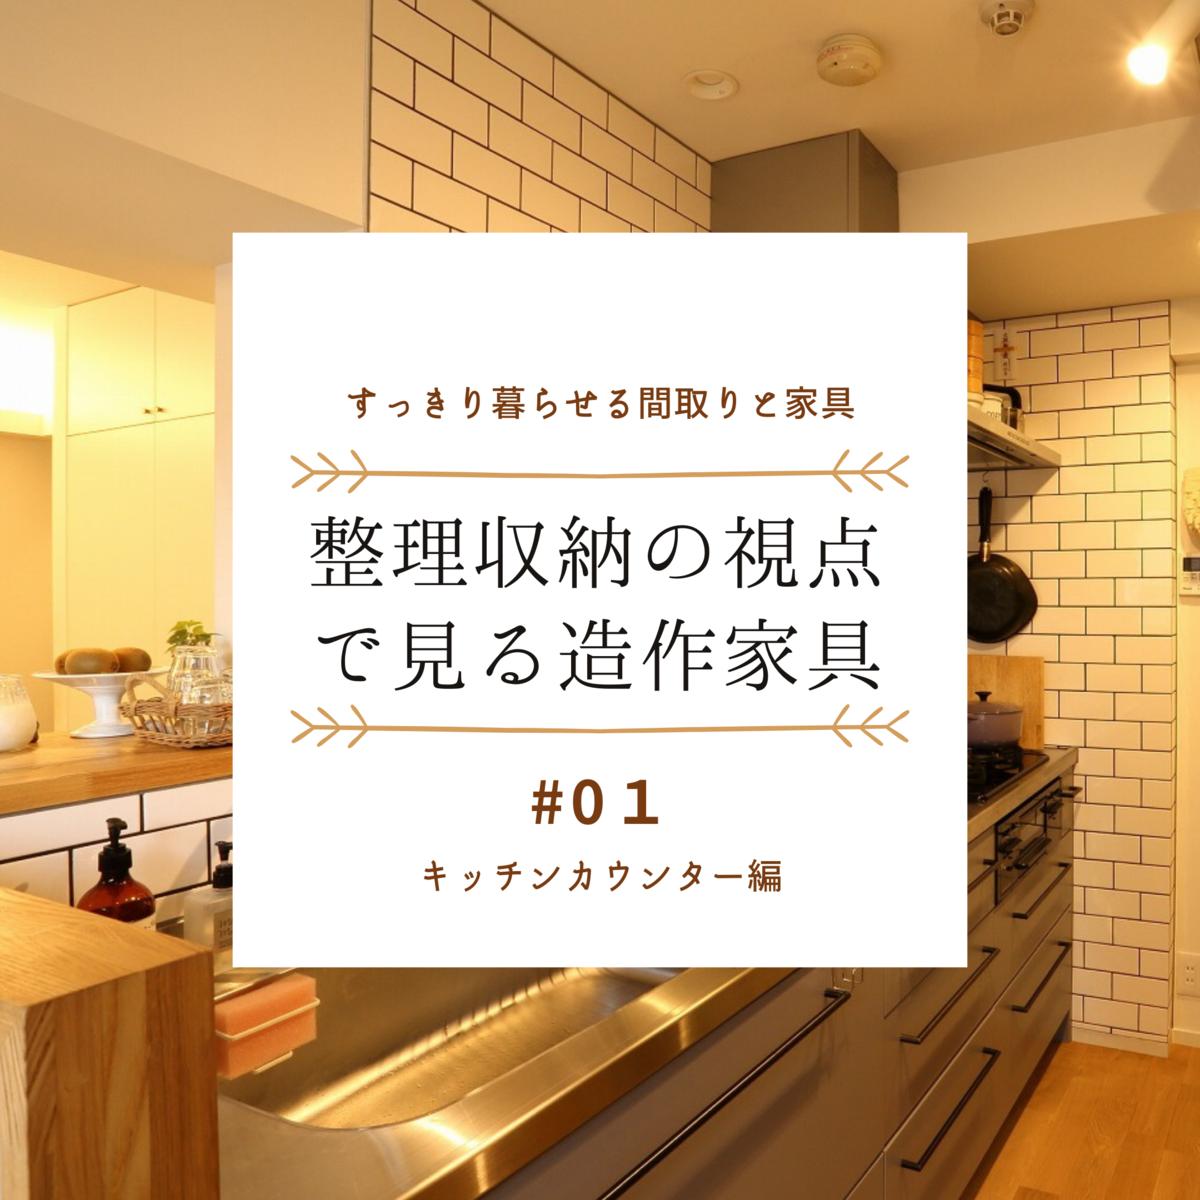 f:id:yusei2000:20201002201524p:plain